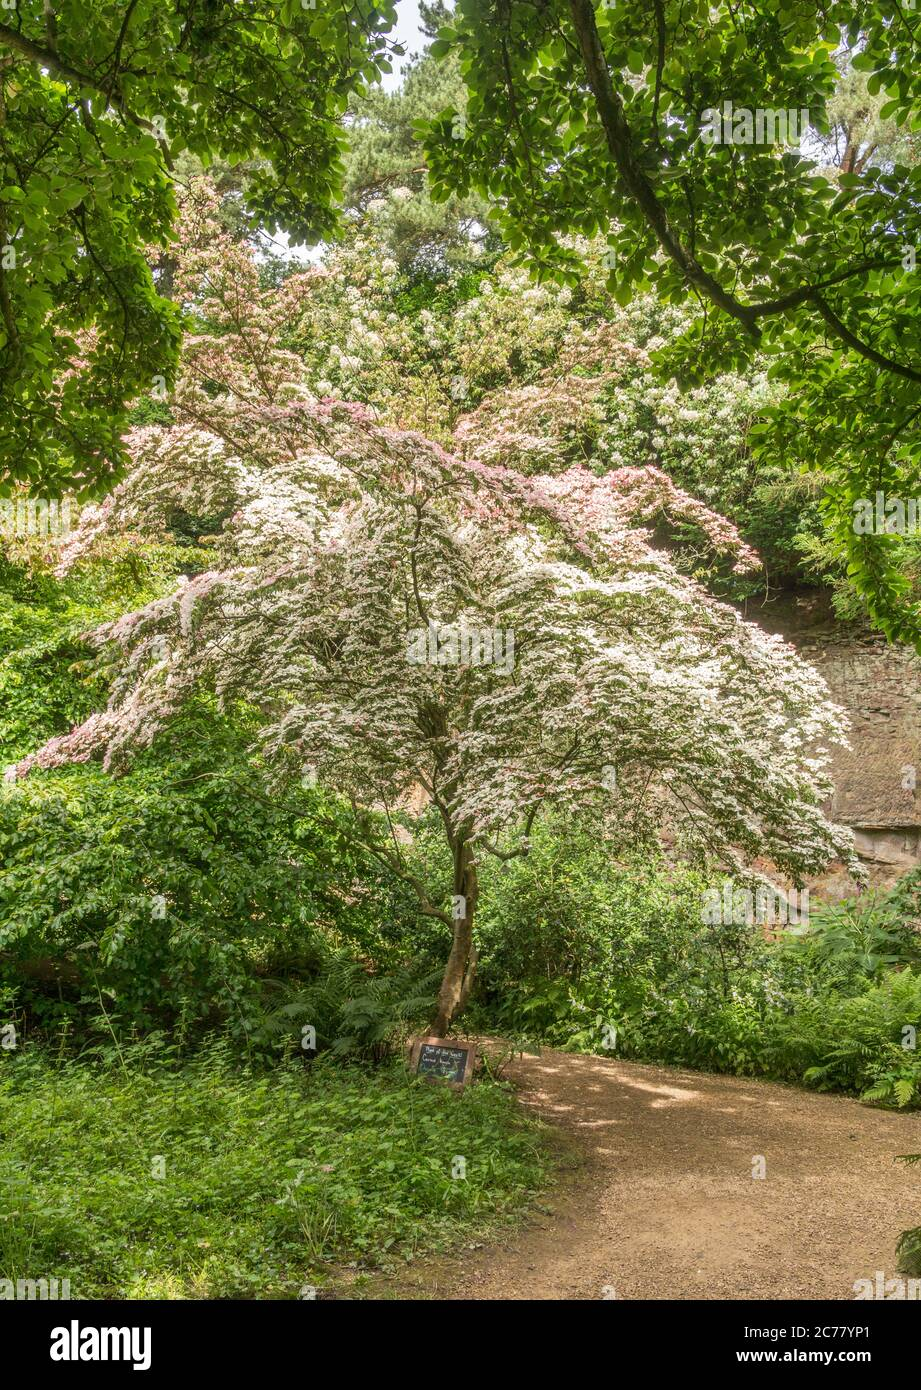 Chinese Dogwood, Cornus Kousa, in flower at the  Belsay Hall estate, Northumberland, England, UK Stock Photo